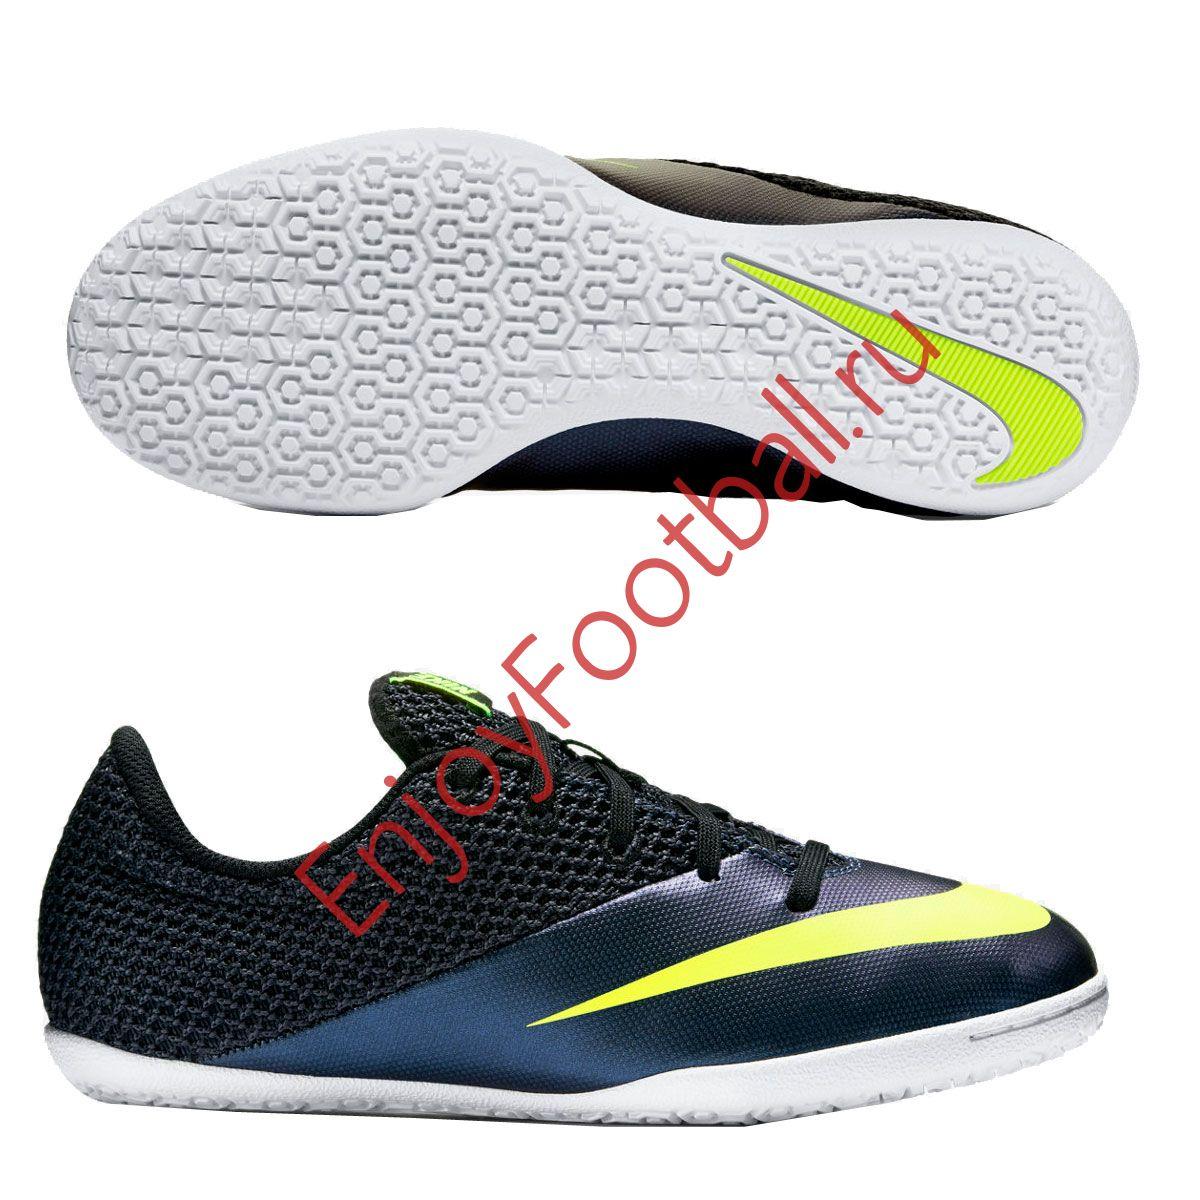 new concept 84ce5 e4929 Детская обувь для зала NIKE MERCURIALX PRO IC 725280-401 JR